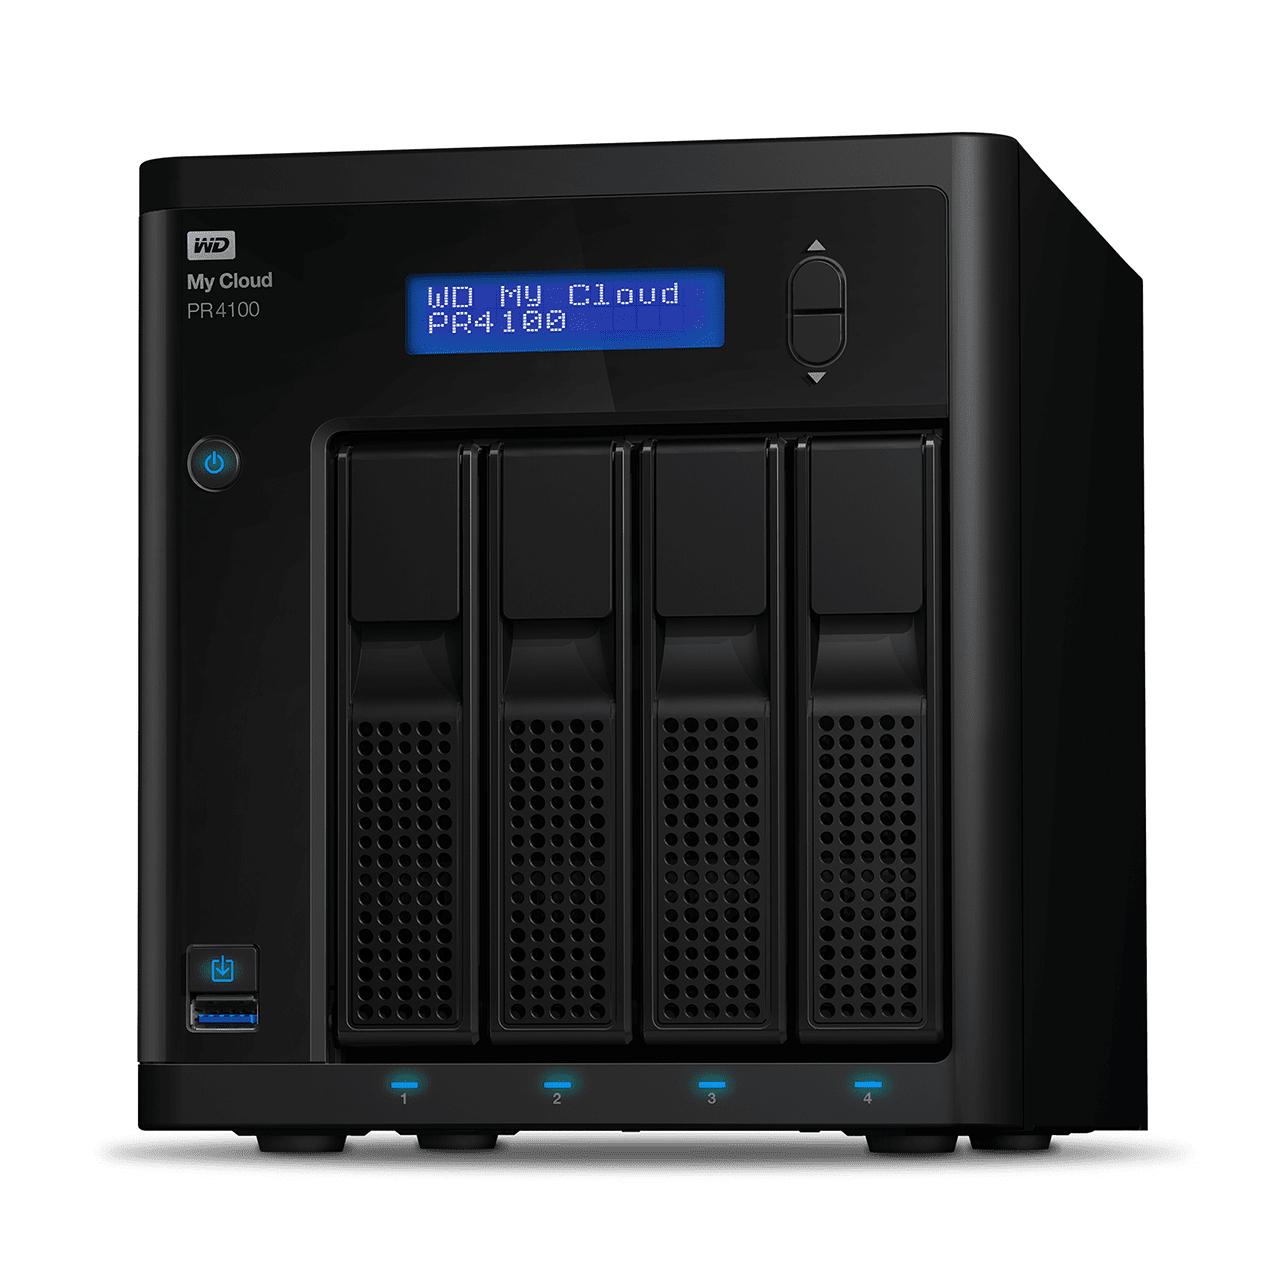 Serveur de stockage NAS WD My Cloud Série Pro PR4100 - 32 To (4 x 8To)